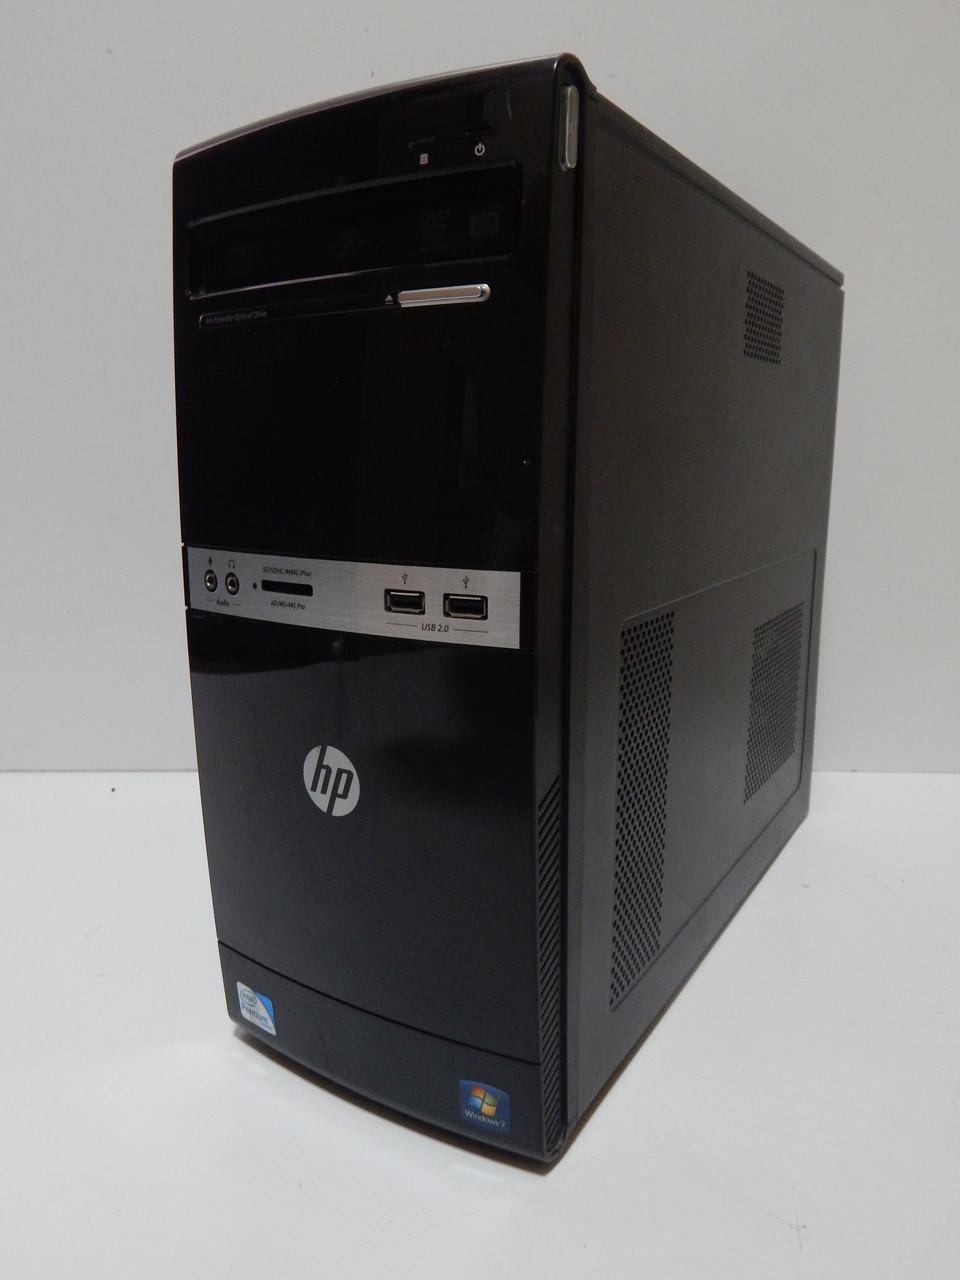 Компьютер HP 500B mt, E5800 (3.2 ГГц) / RAM 4 ГБ / Intel GMA 4500